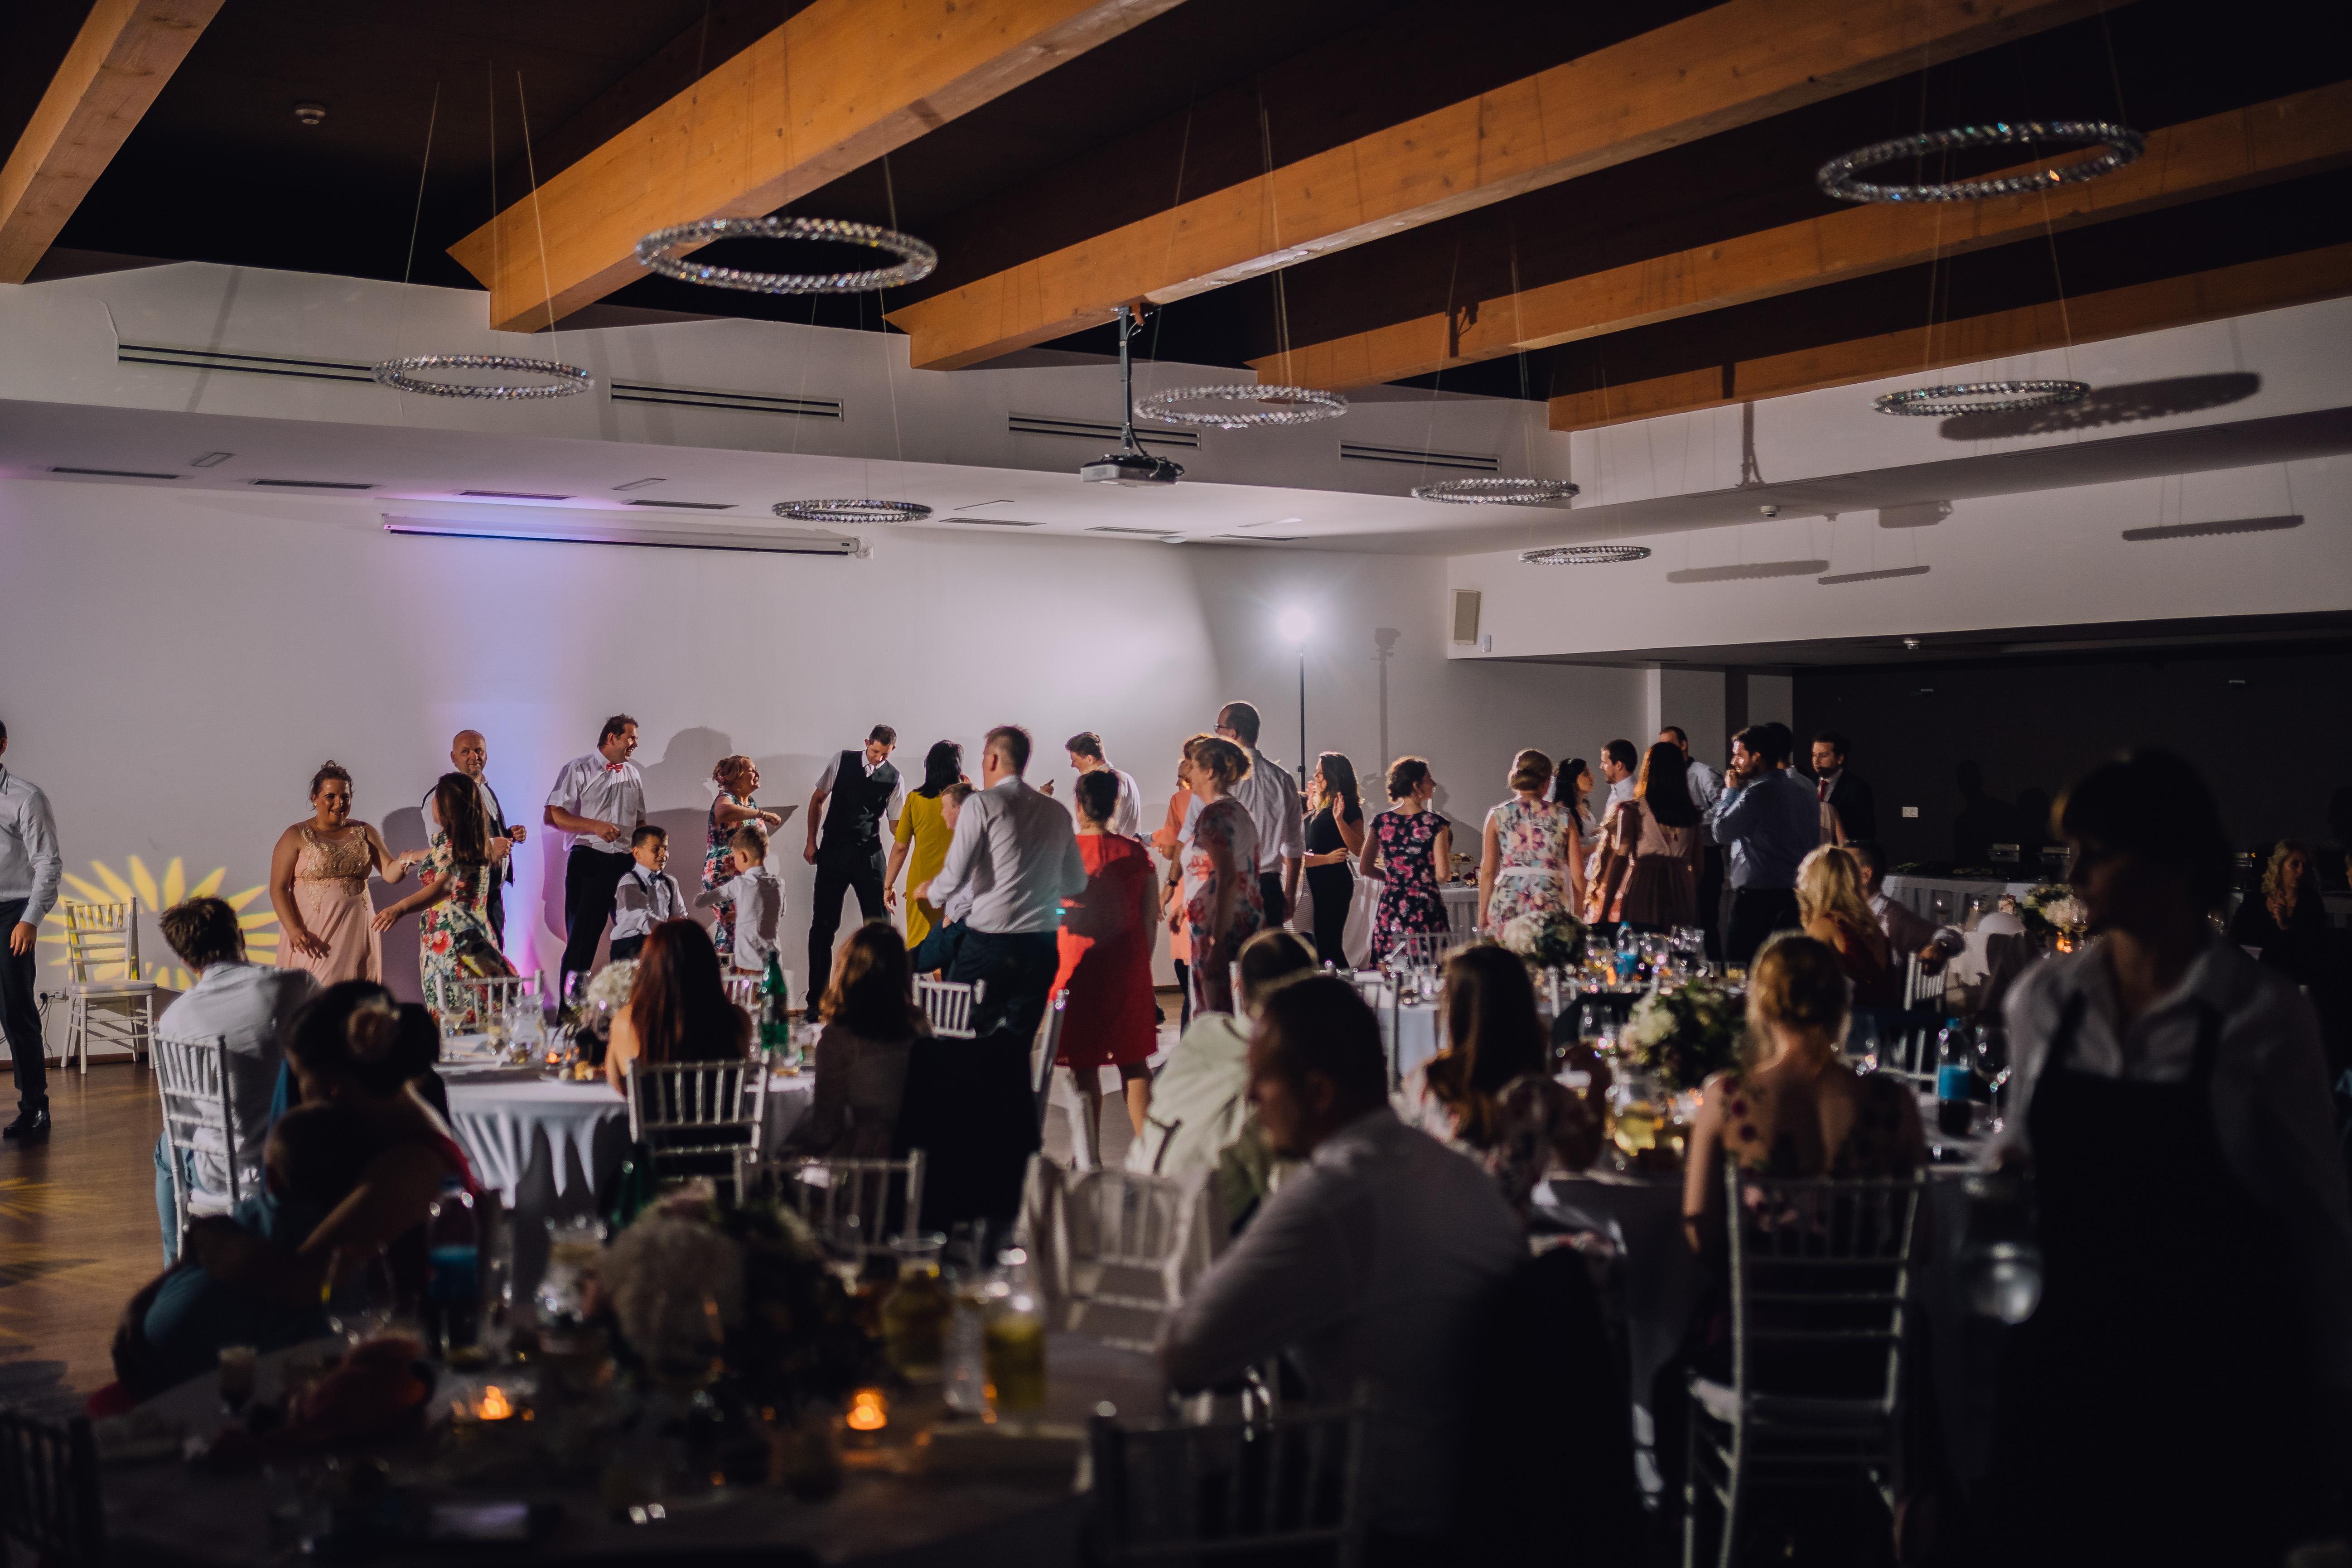 Svadba Jana a Peter, Kongresová sála Relax Trnava 02 #svadobnyDJ, #djanasvadbu, #svadba, #svadbatrnava, #svadbarelaxtrnava